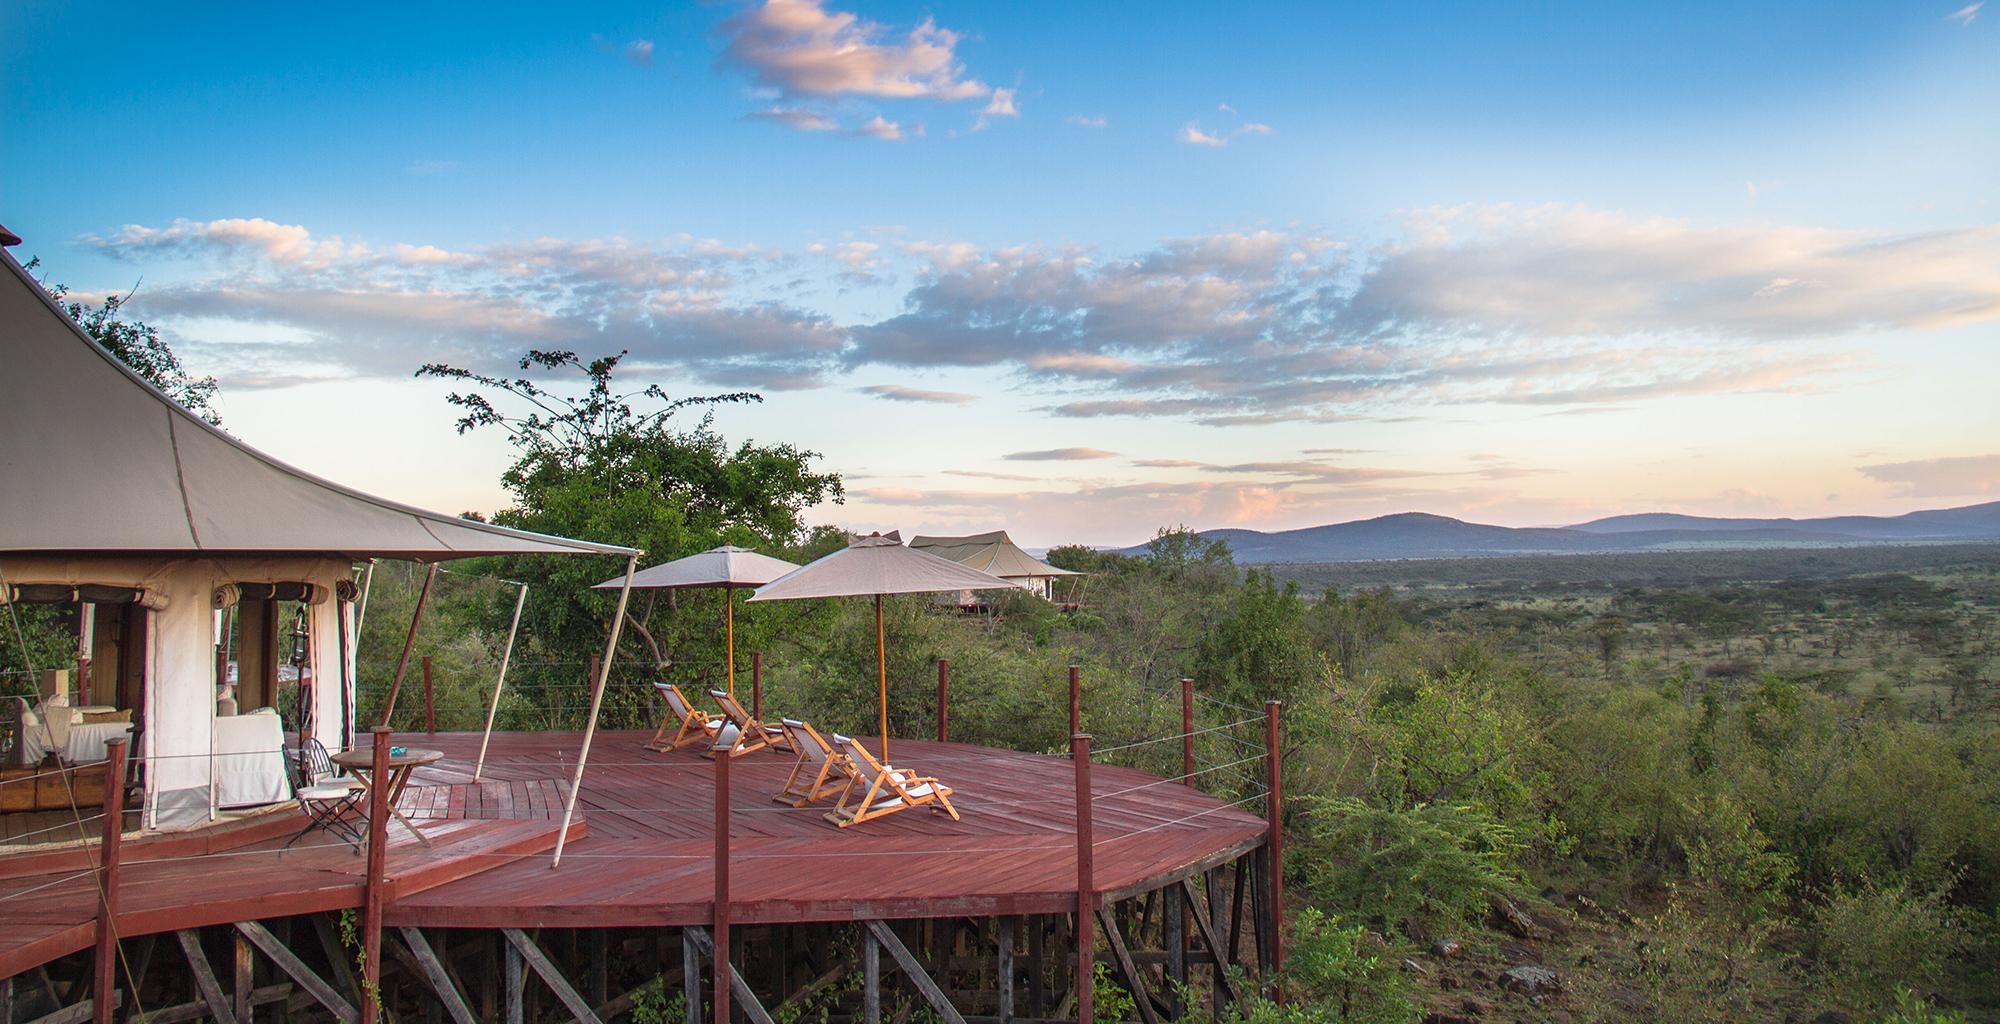 Kenya-Ol-Seki-Camp-Deck-View